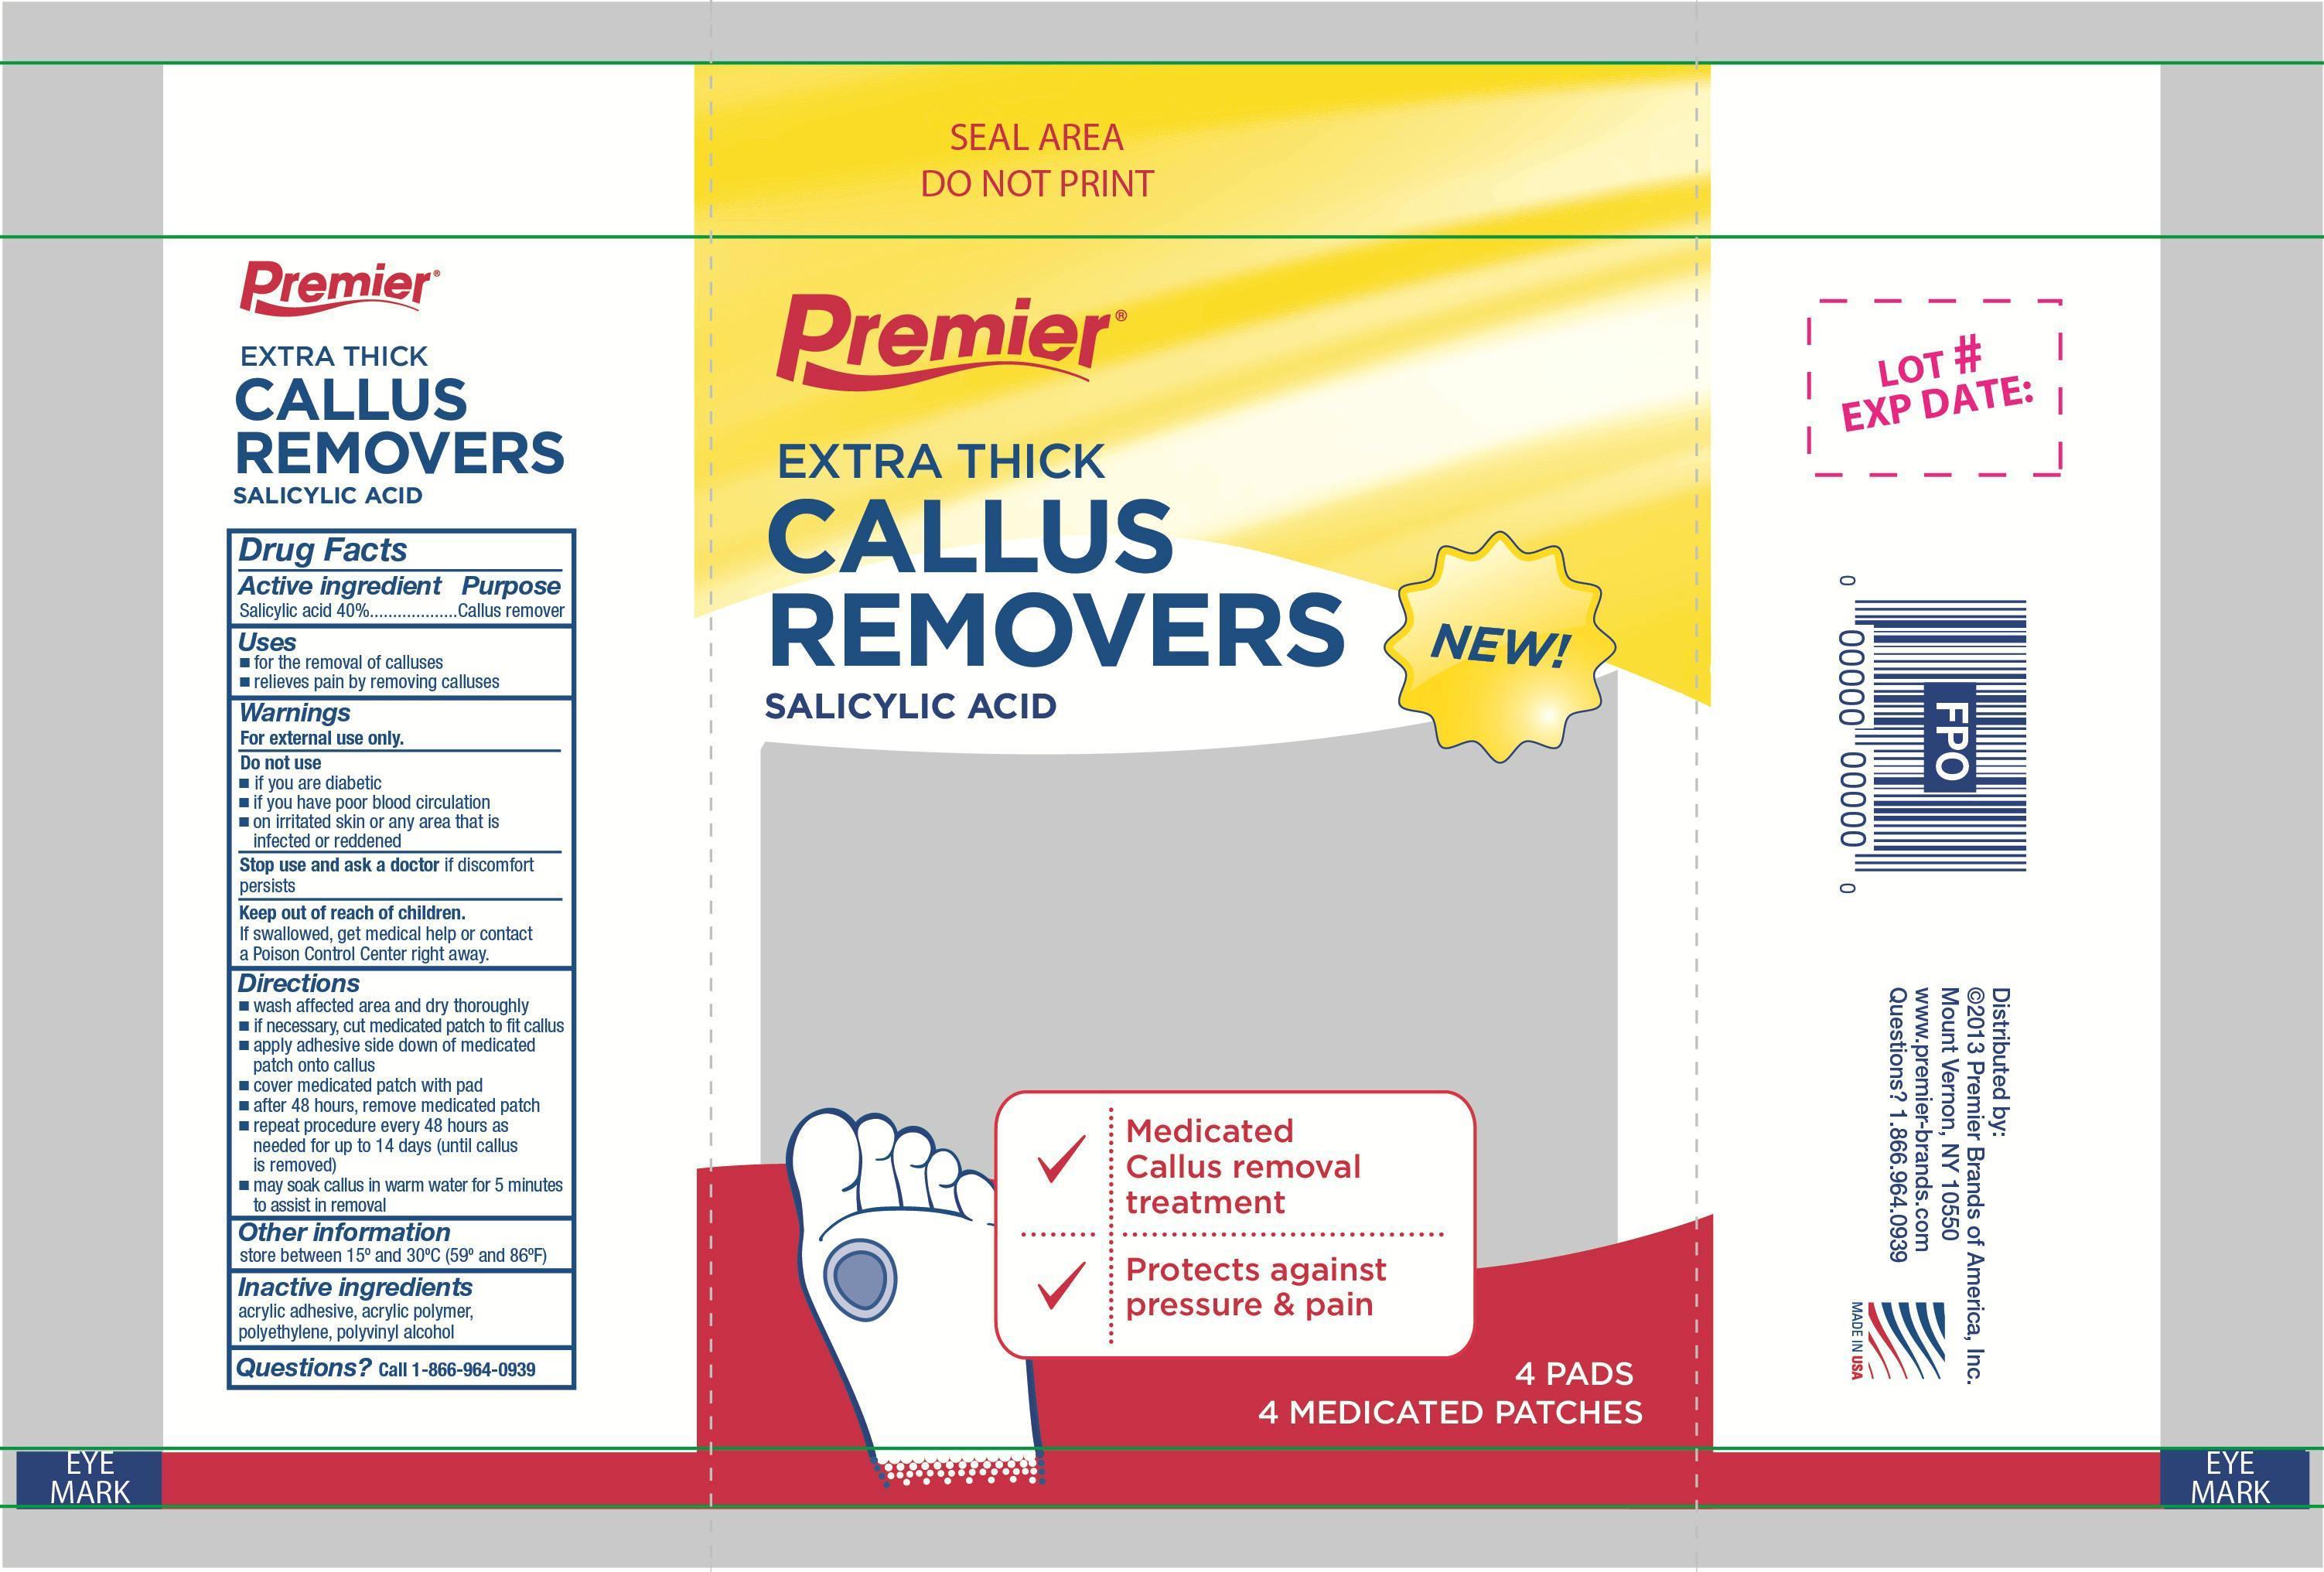 PB Callus Removers EXTRA THICK.jpg